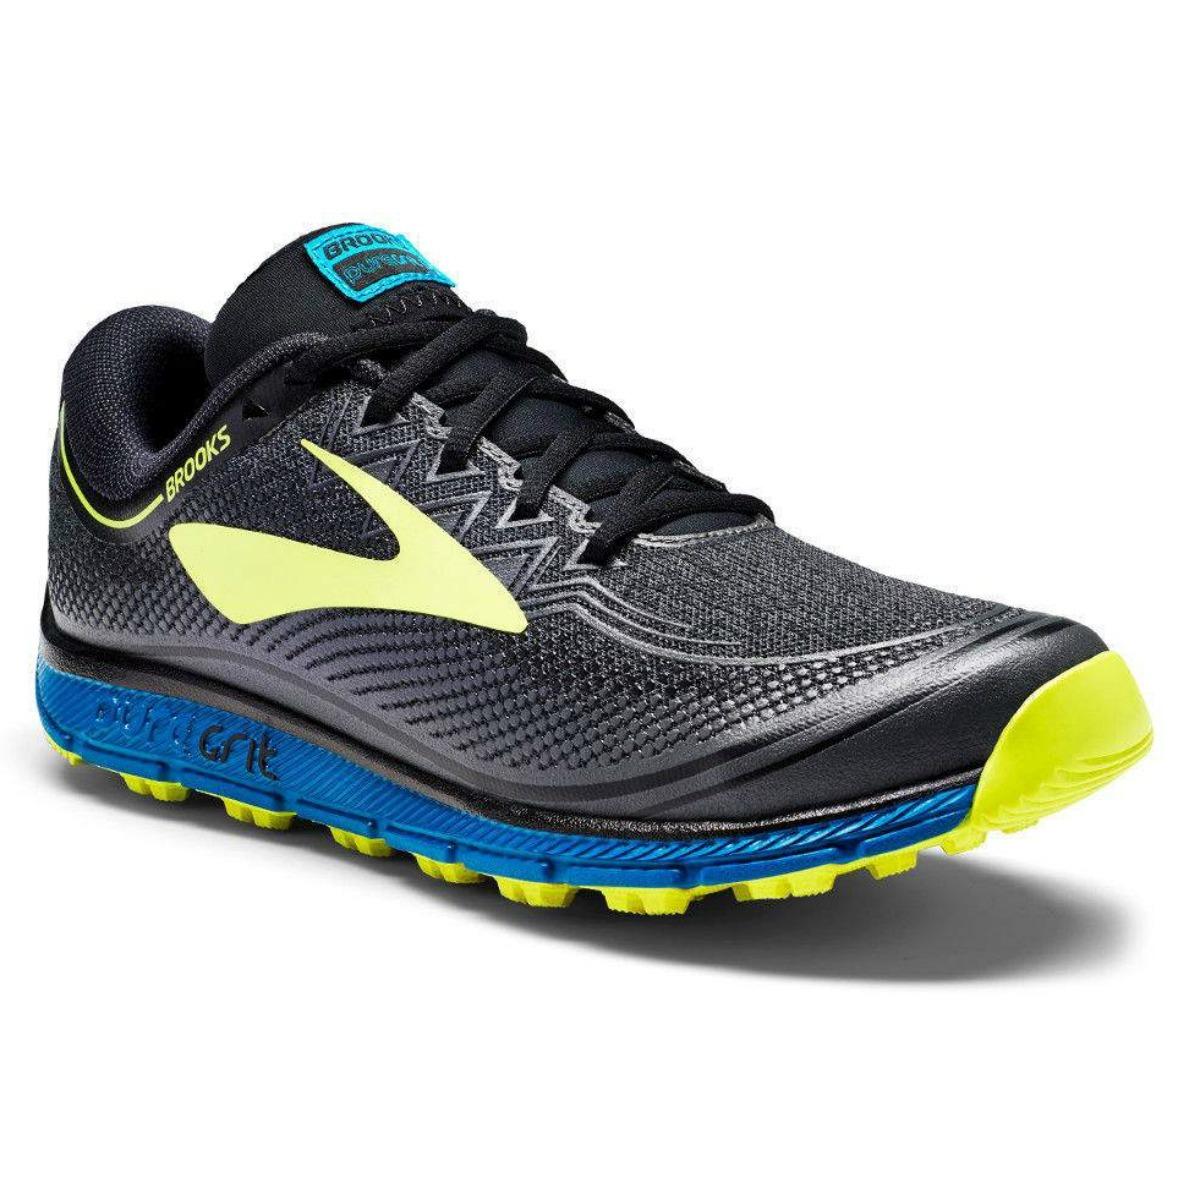 dbd67383978 zapatillas hombre brooks puregrit 6 estilo trail. Cargando zoom.